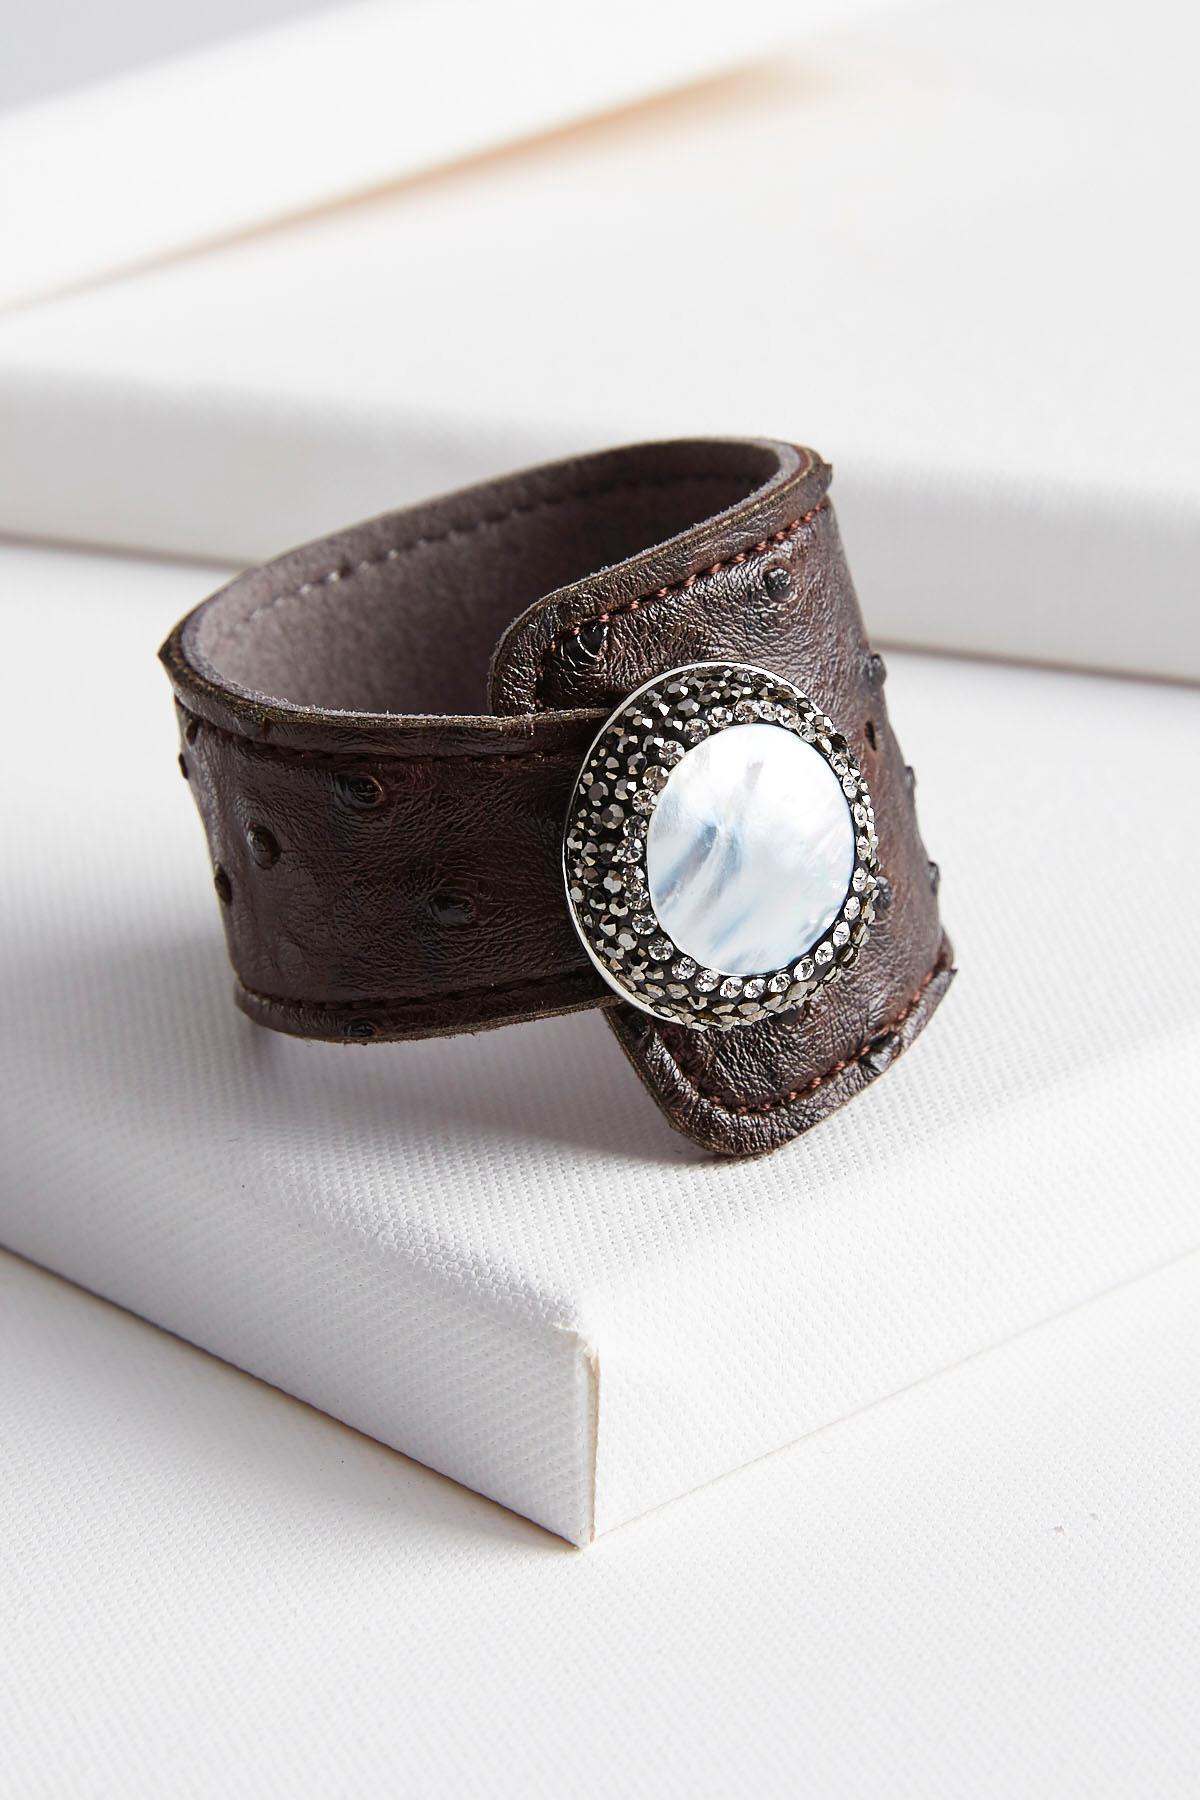 Jeweled Faux Leather Wrap Bracelet